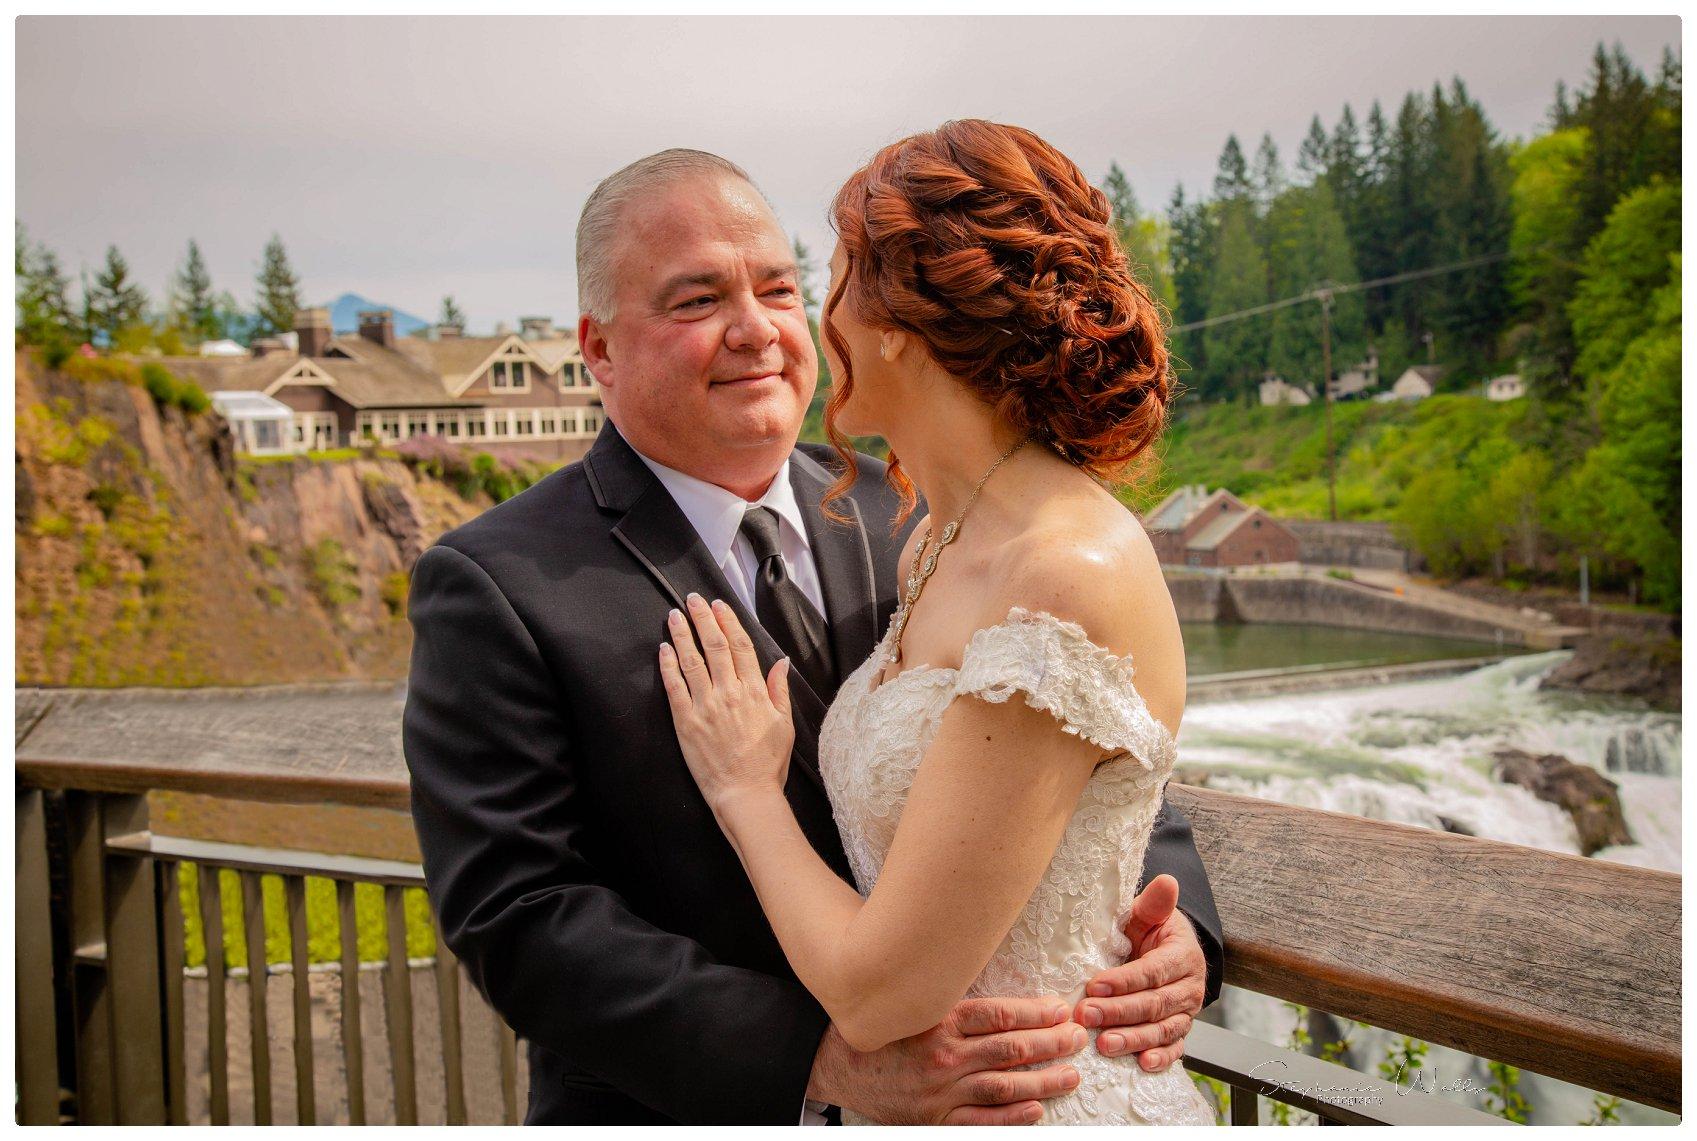 Portraits Ceremony 040 Salish Lodge & Spa    Elopement With Liz and Paul